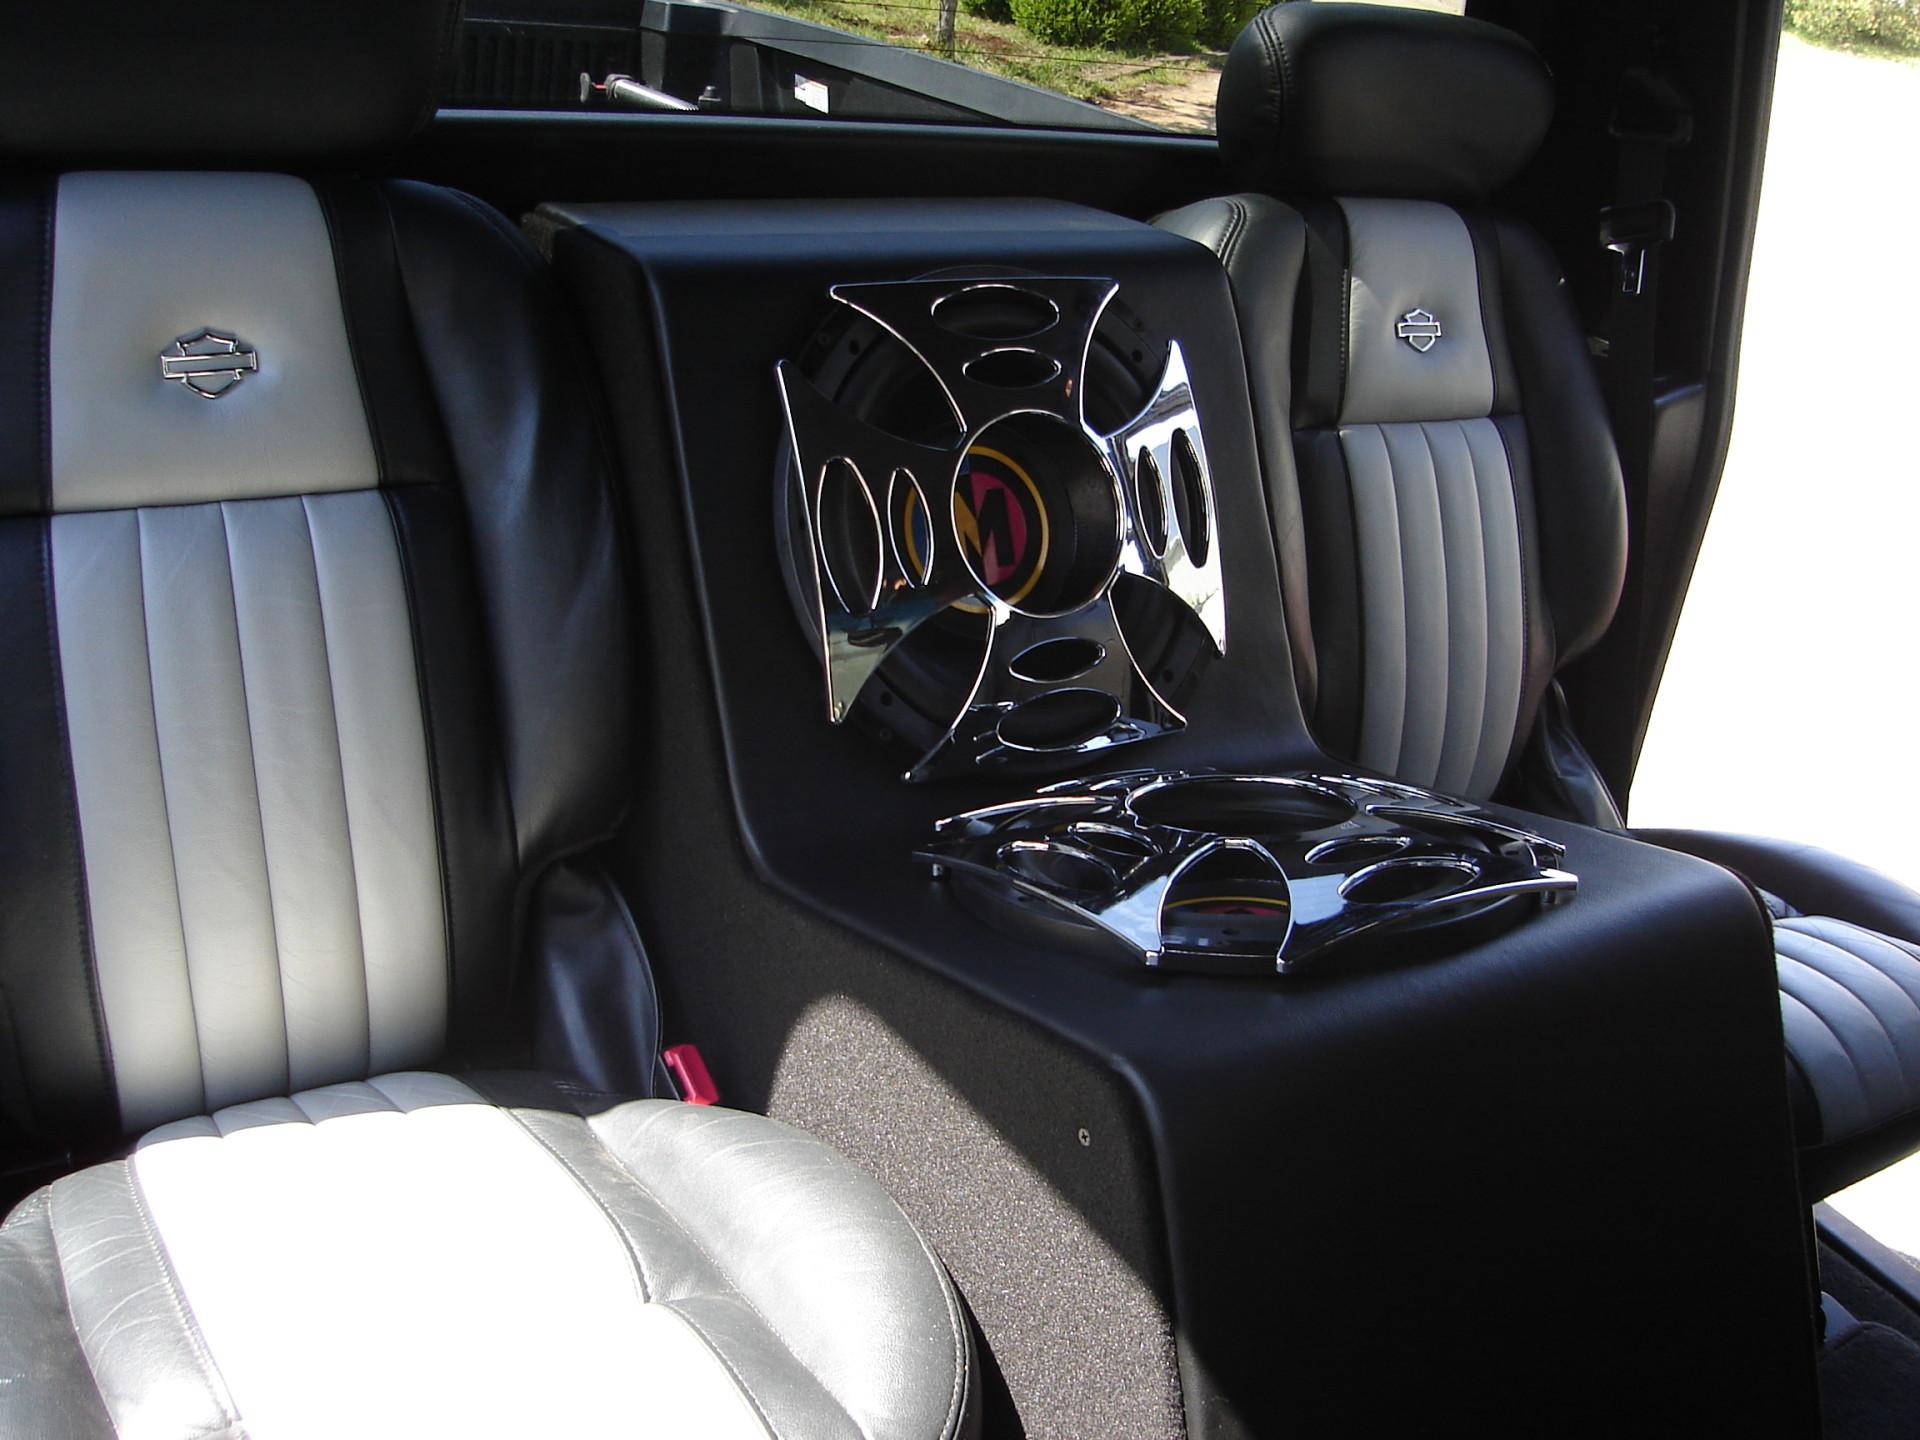 Napa Car Audio